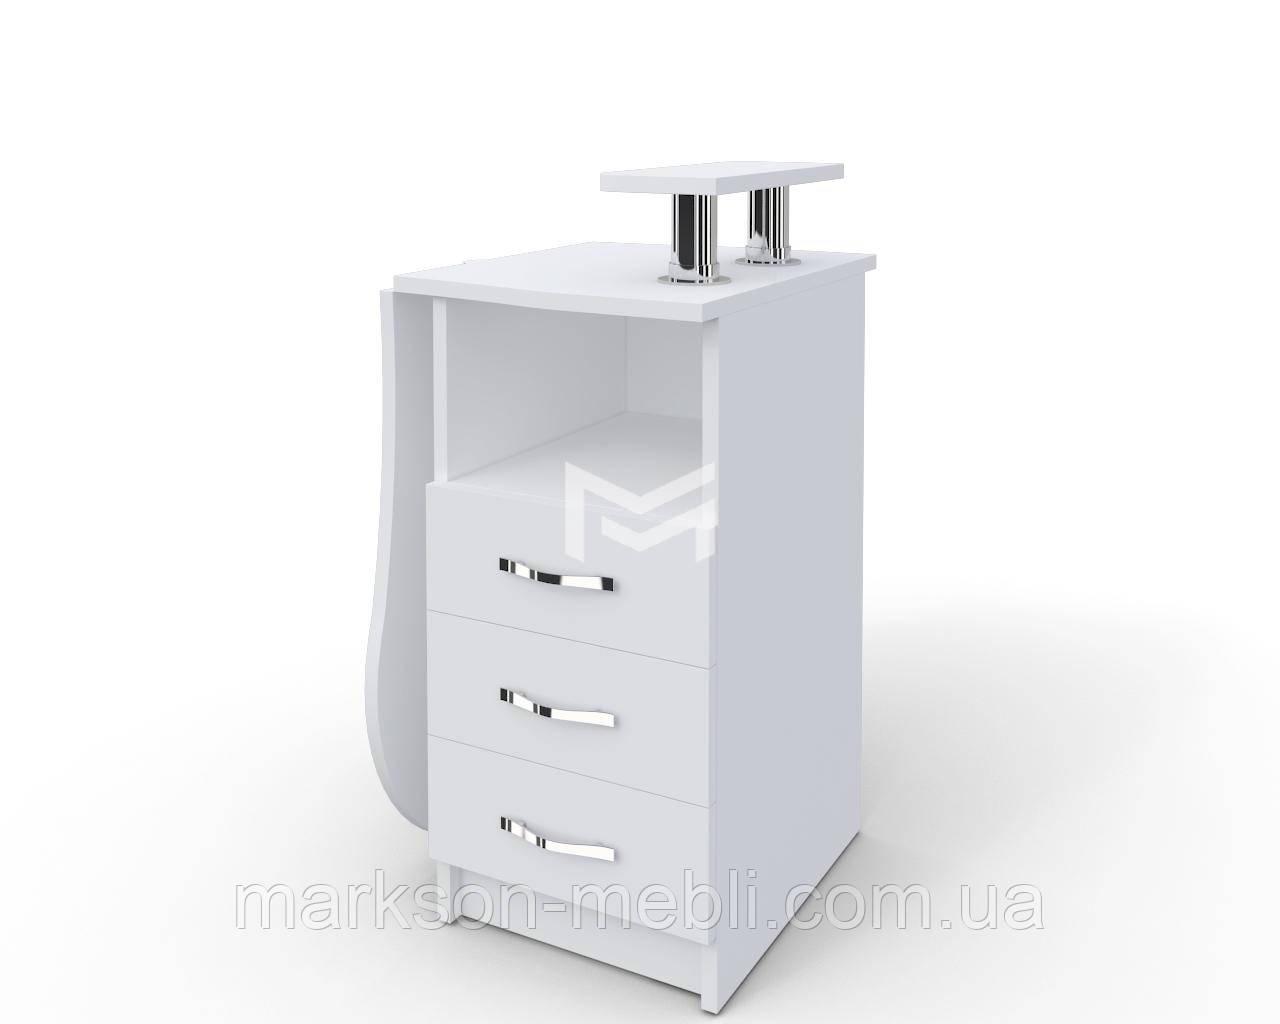 "Стол для маникюра M102 K ""Эстет №2"" компакт"